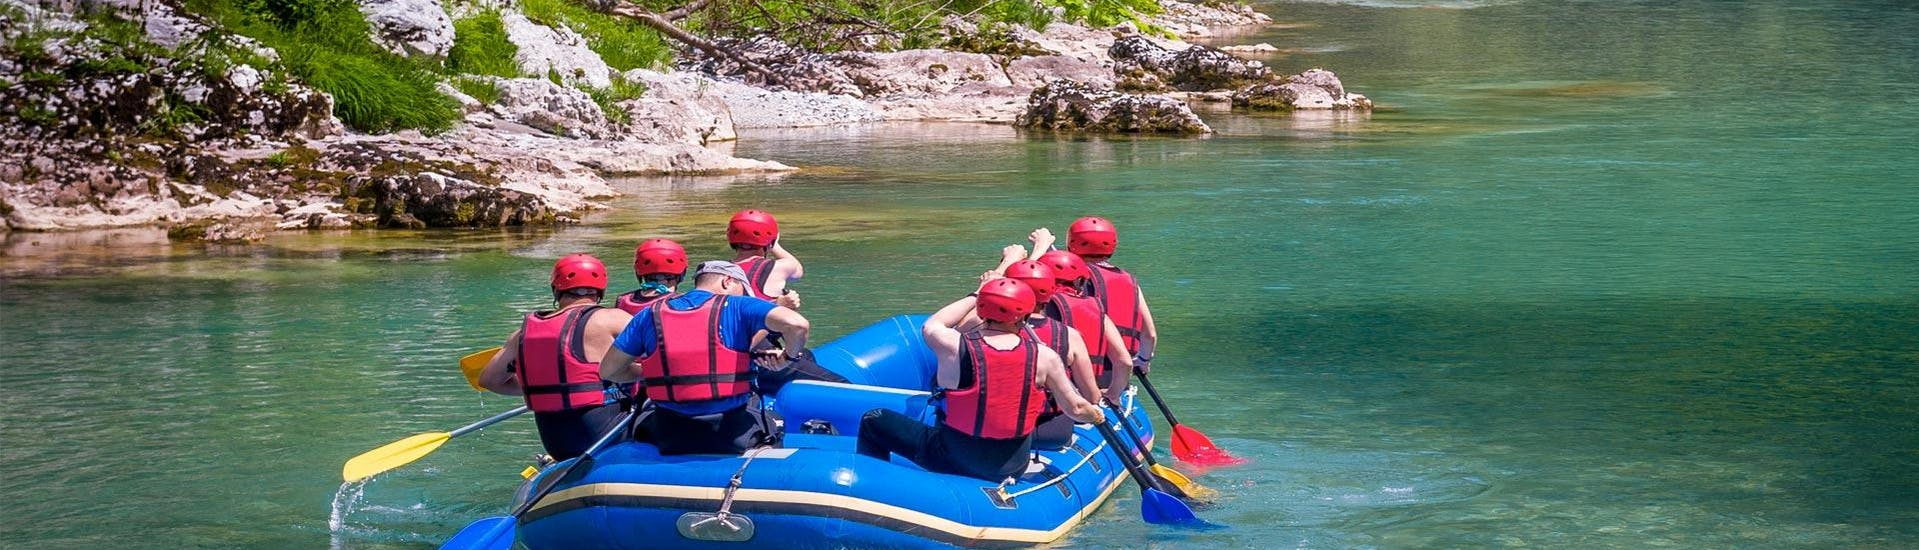 rafting-matterhorn-vispa-valrafting-hero